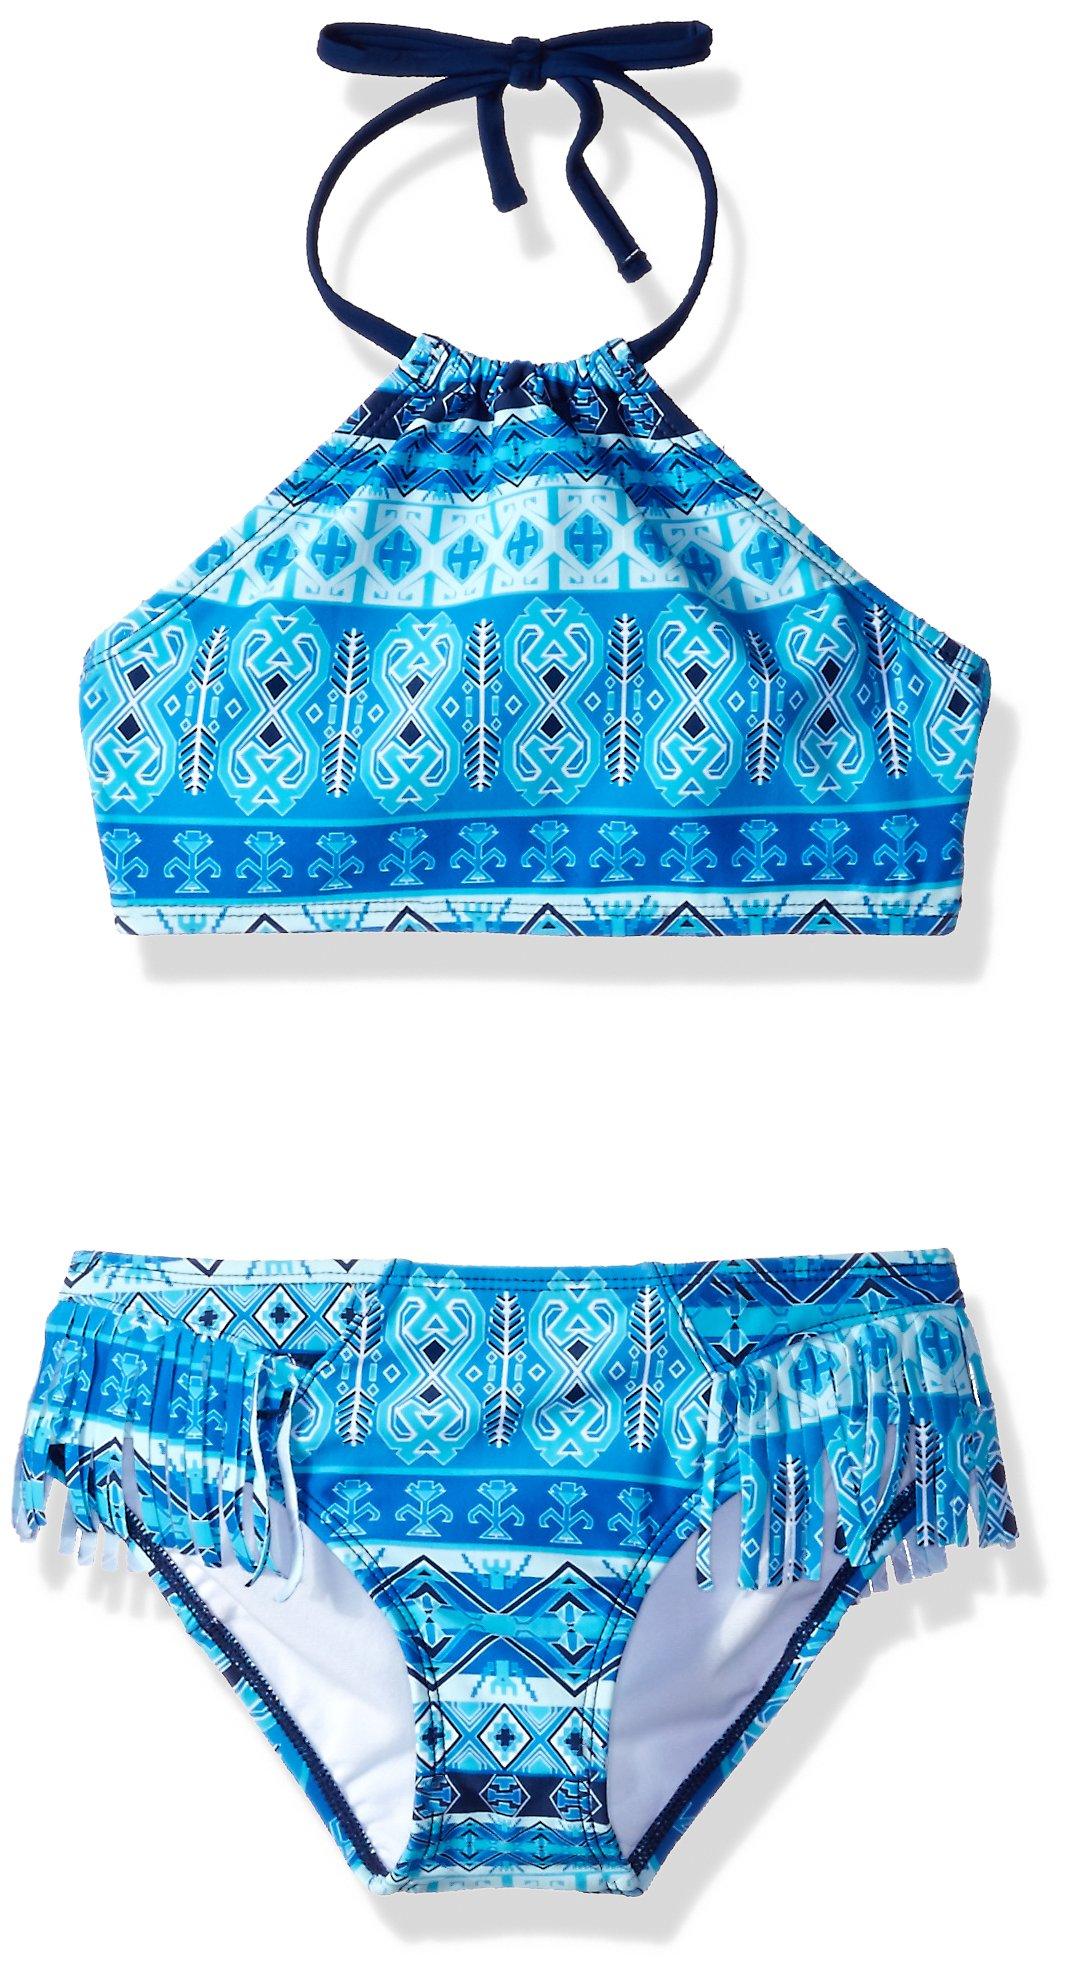 Kanu Surf Big Girls' Mahina Halter Bikini Beach Sport 2-Piece Swimsuit, Blue, 12